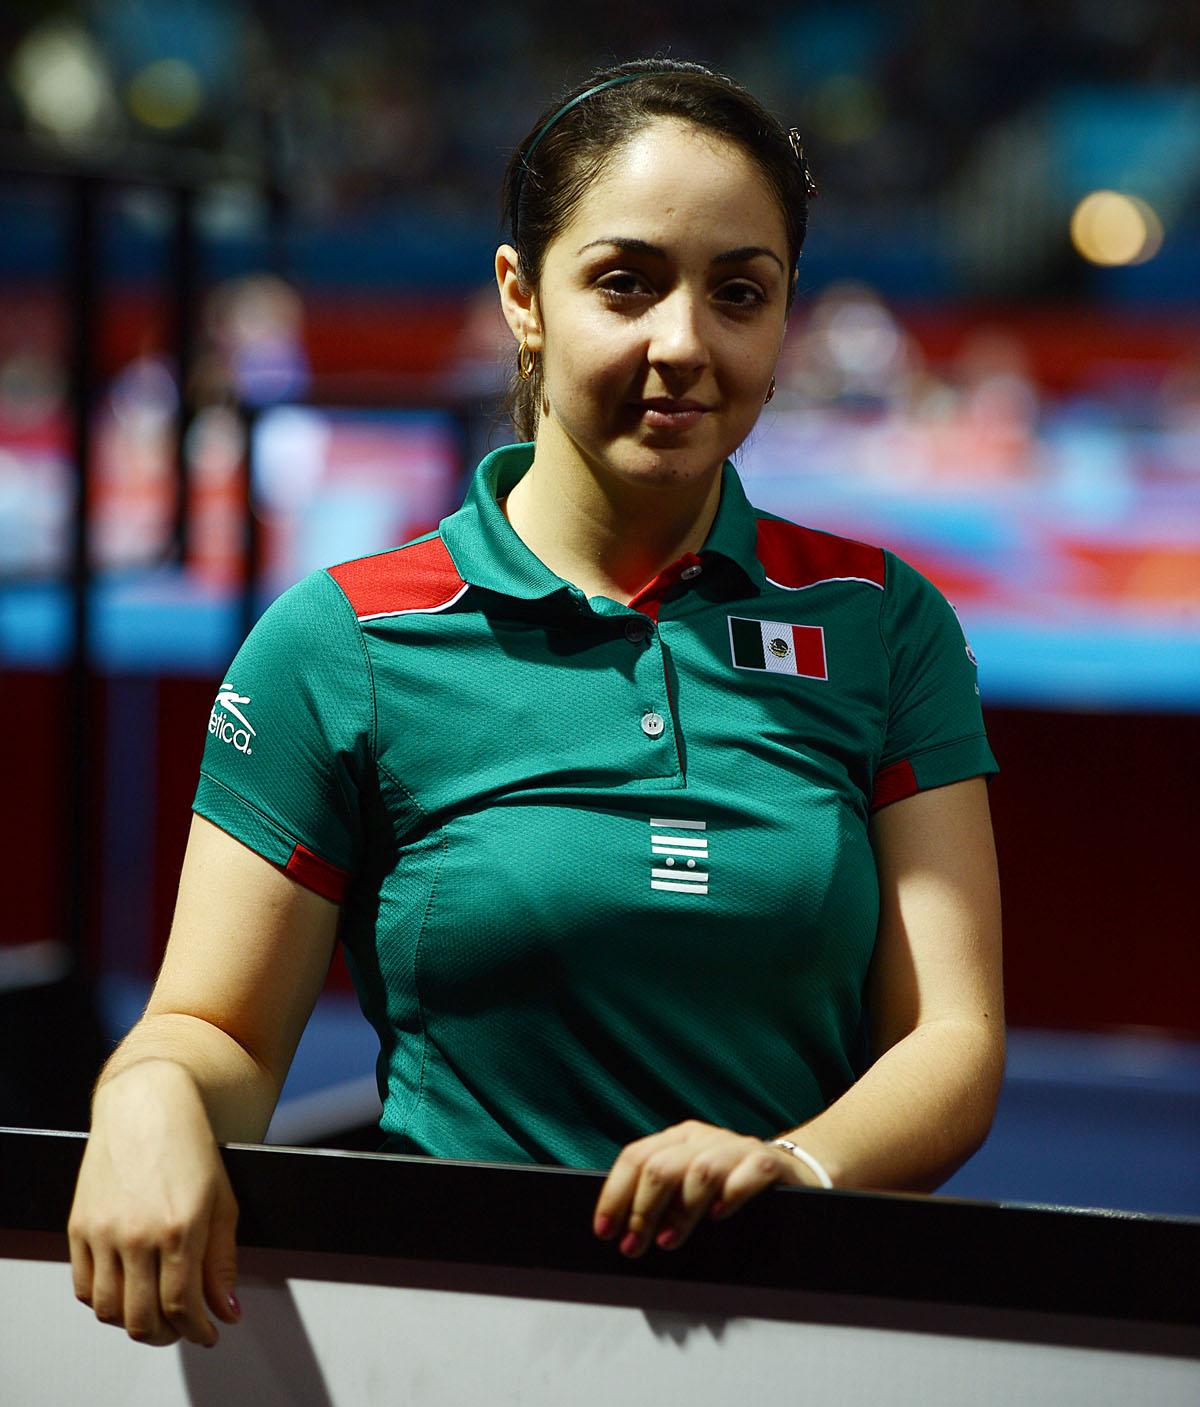 Selección femenil de tenis de mesa busca su boleto a Barranquilla